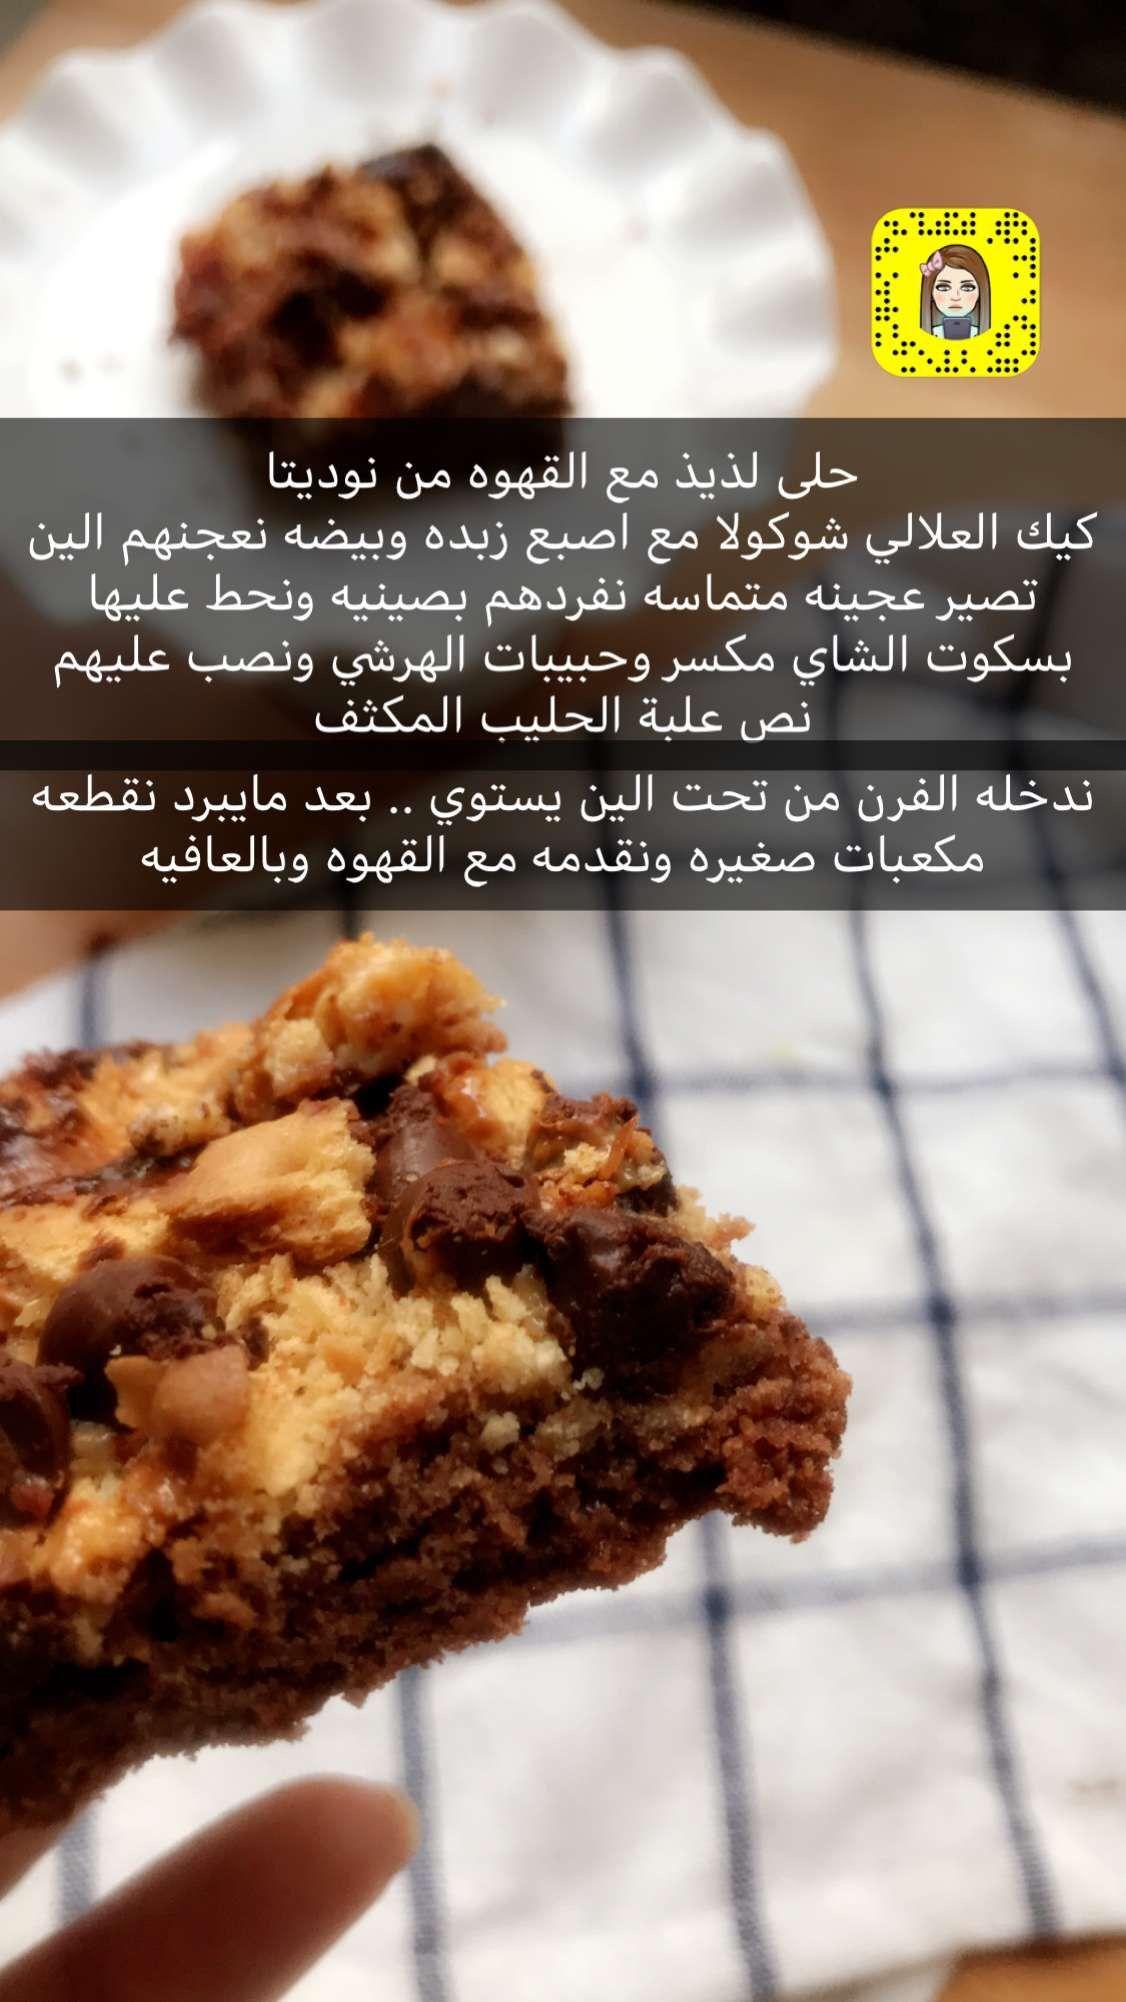 حلى قهوه كيك كوكيز Food Recipies Dessert Recipes Food Receipes